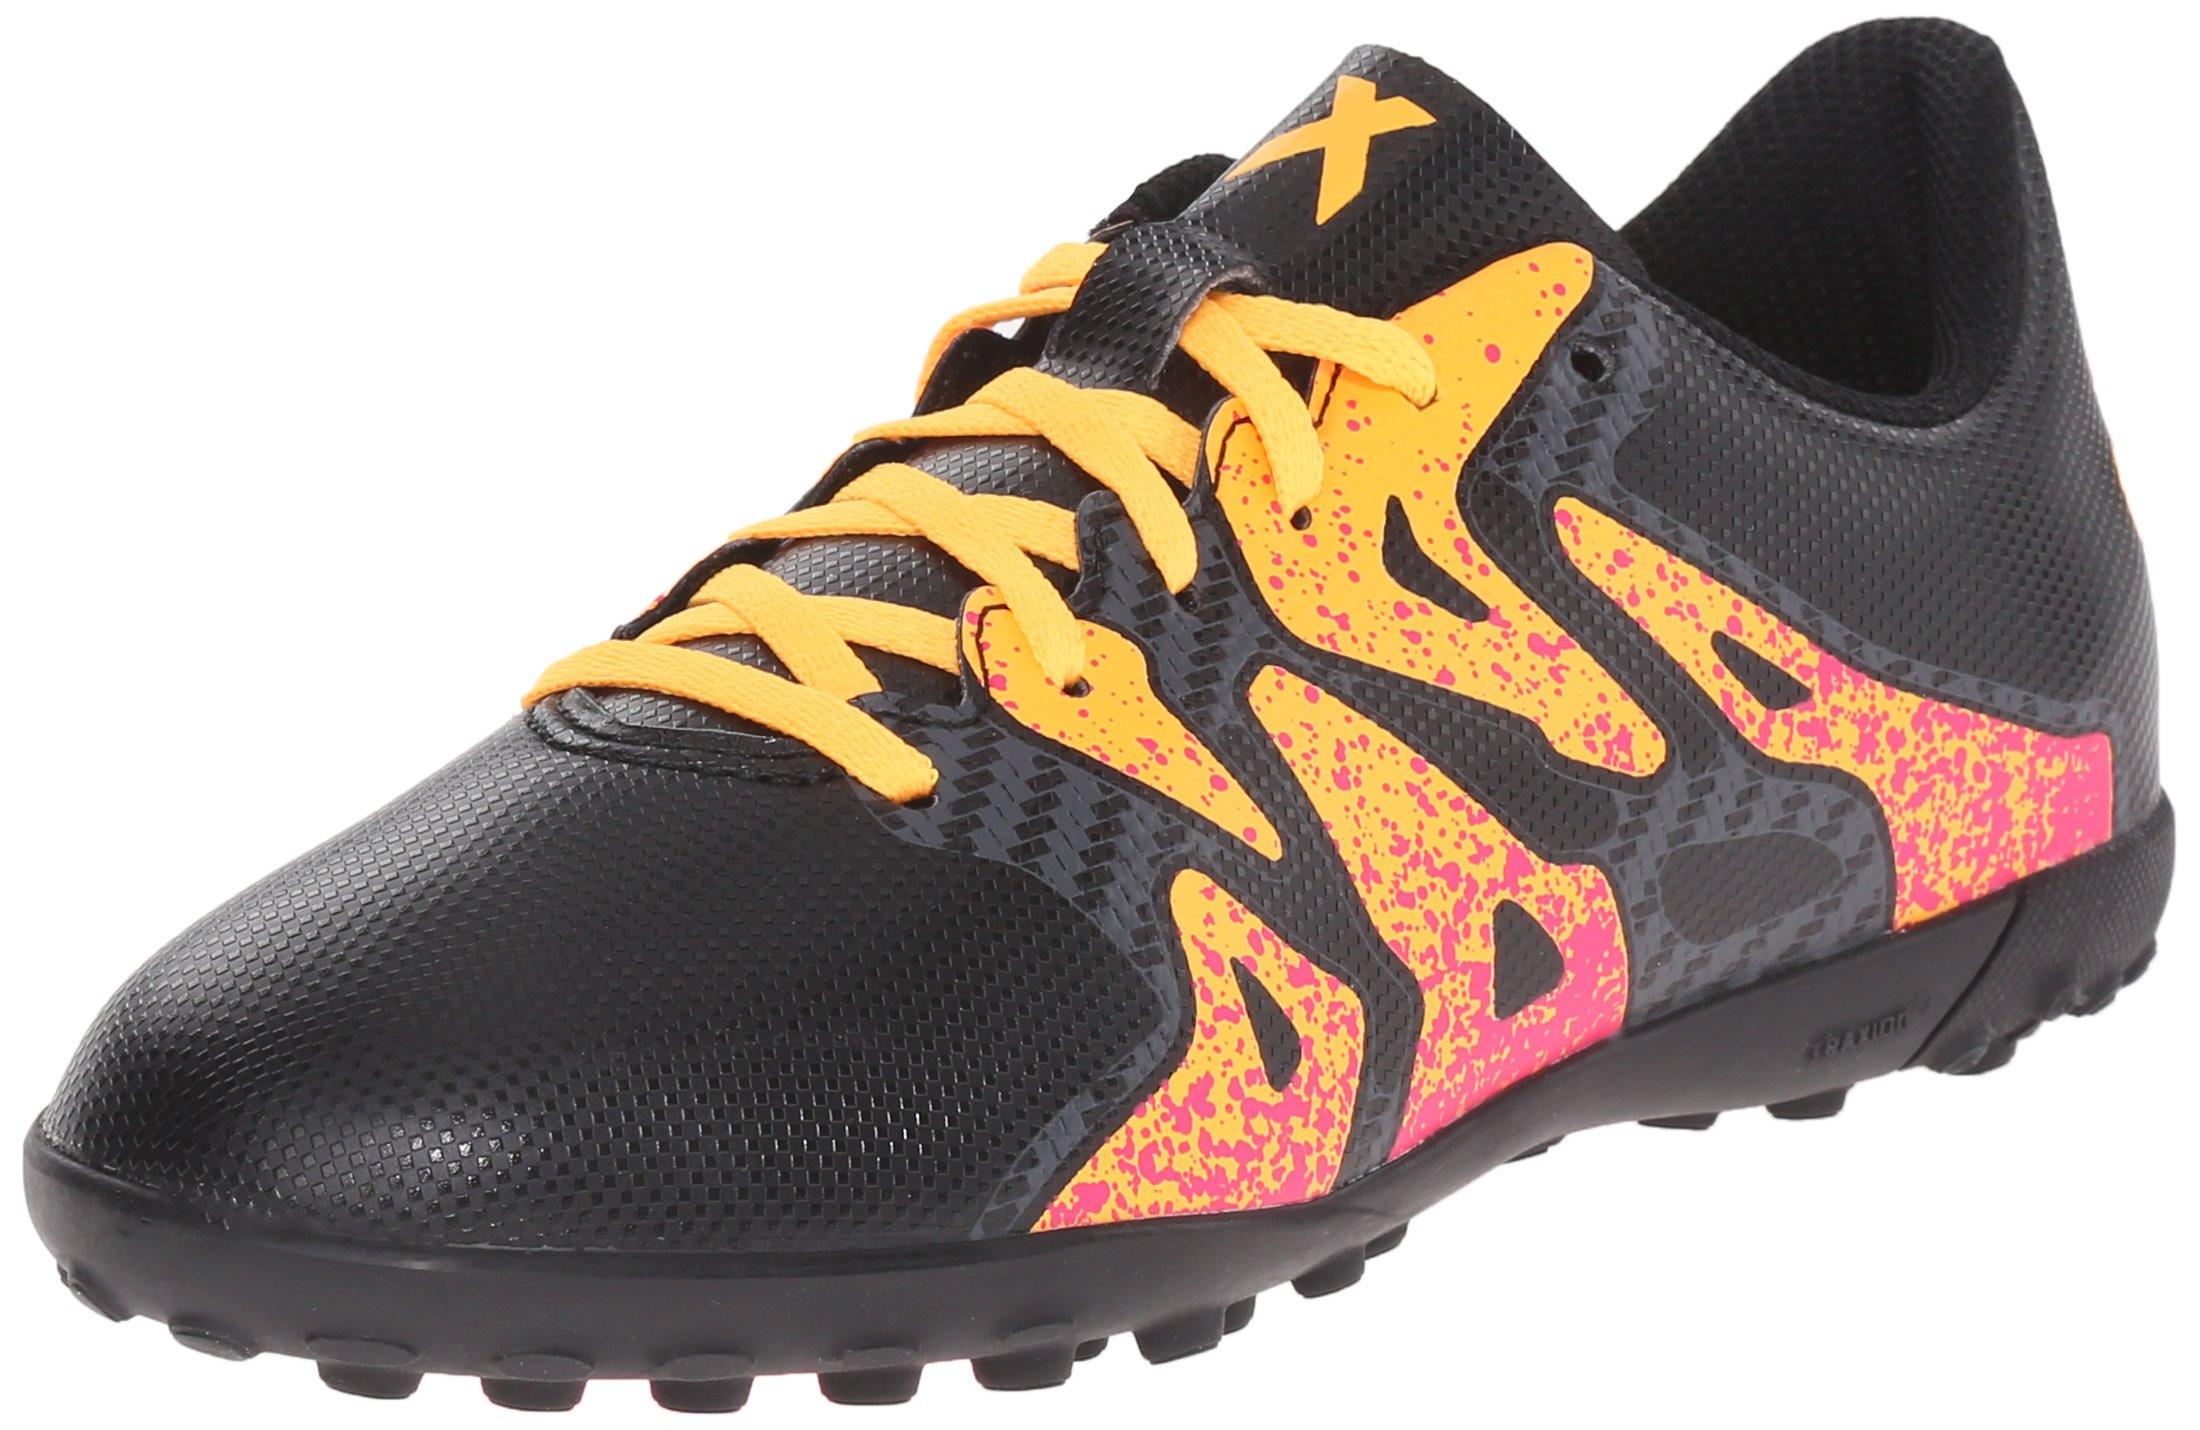 adidas Performance X 15.4 TF J Soccer Shoe (Little Kid/Big Kid),Black/Shock Pink/Gold,10.5 M US Little Kid